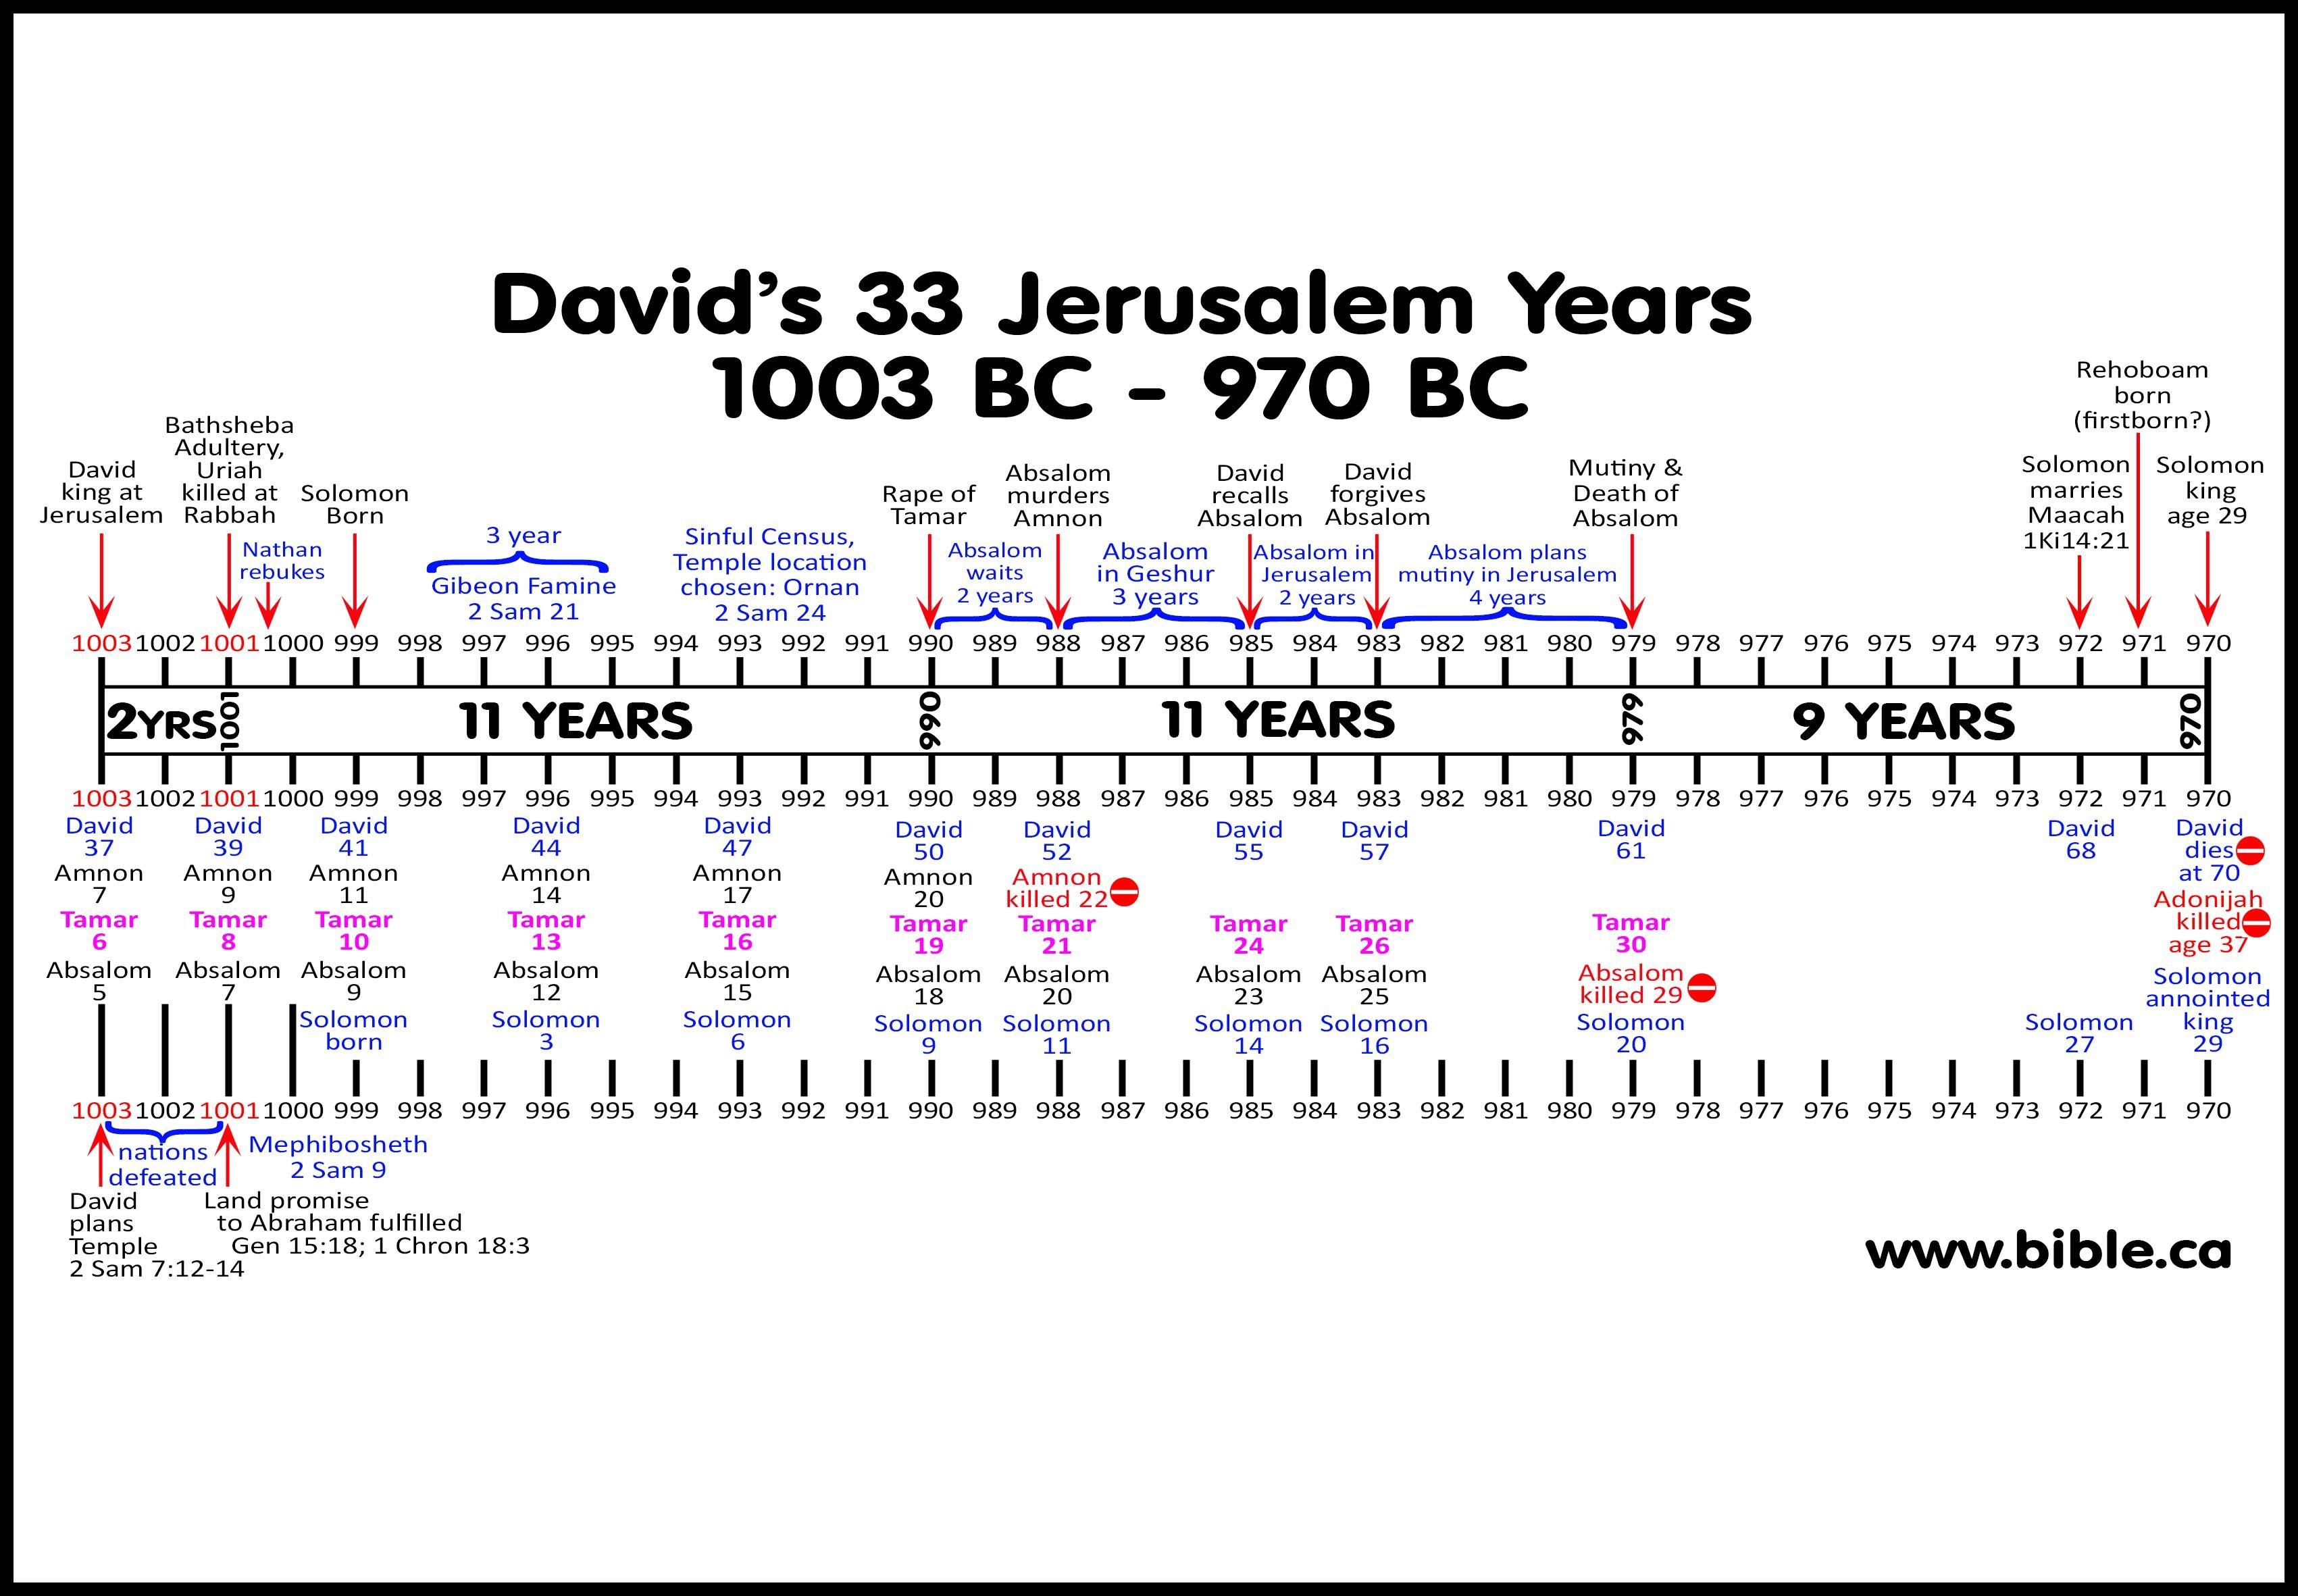 Kingdom Of David Fulfills Abraham S Land Promise 997 995